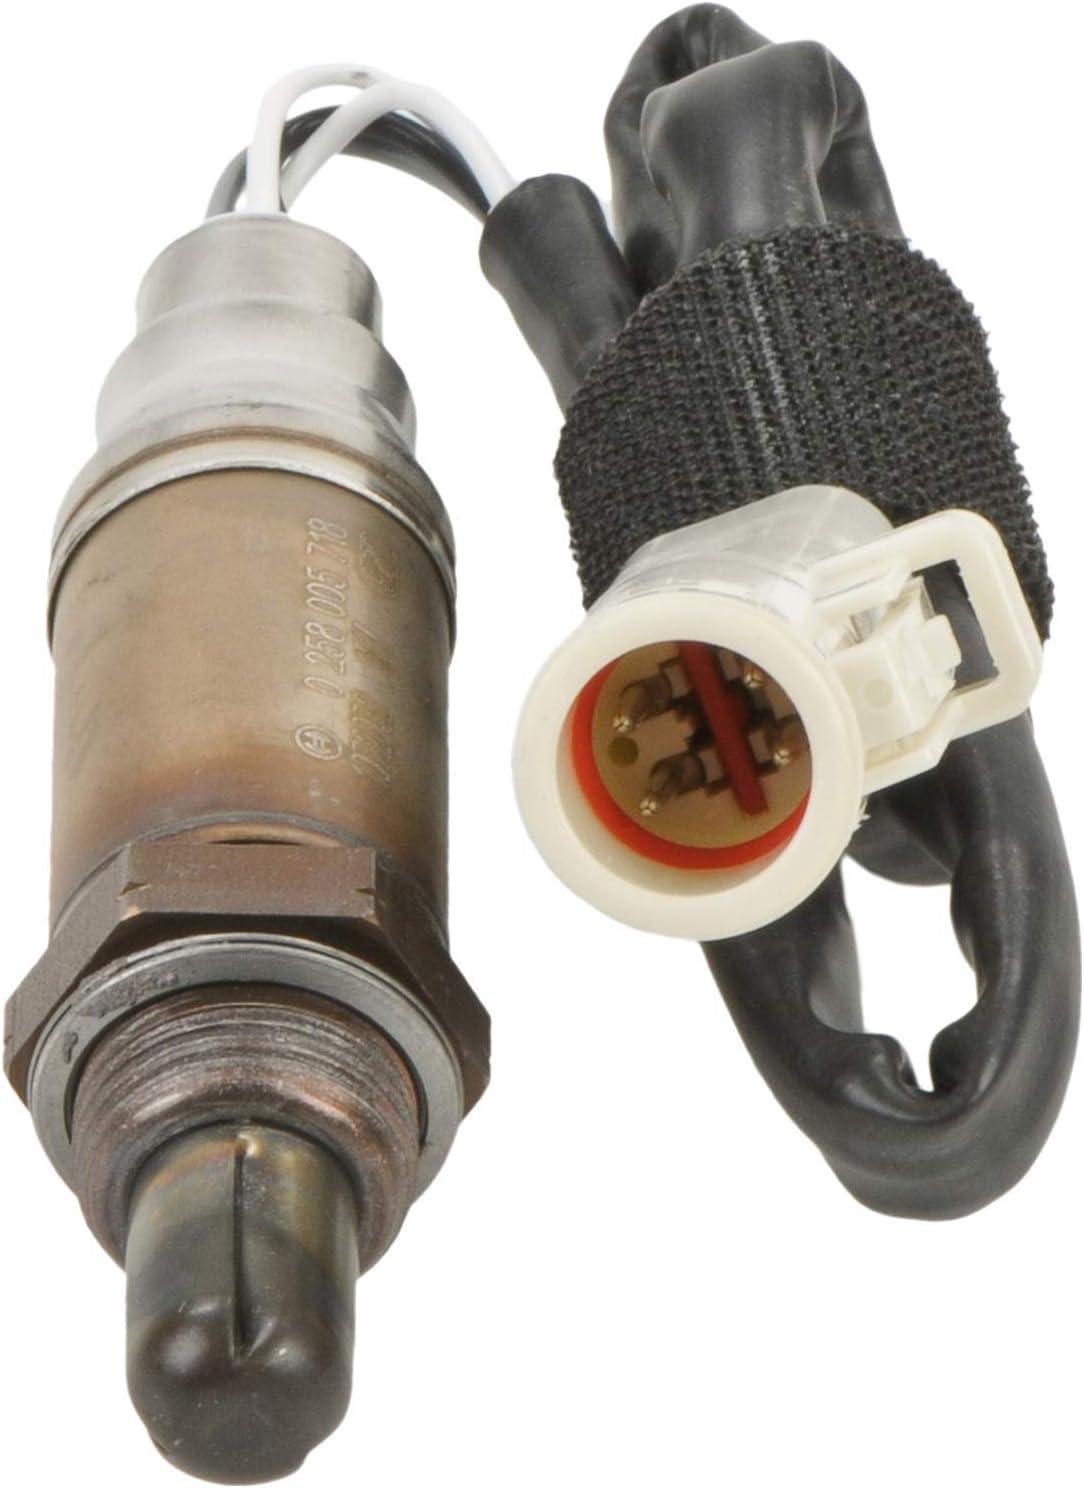 Bosch 15718 Oxygen Sensor Original Equipment Ford, Jaguar, Lincoln, Mazda, Mercury